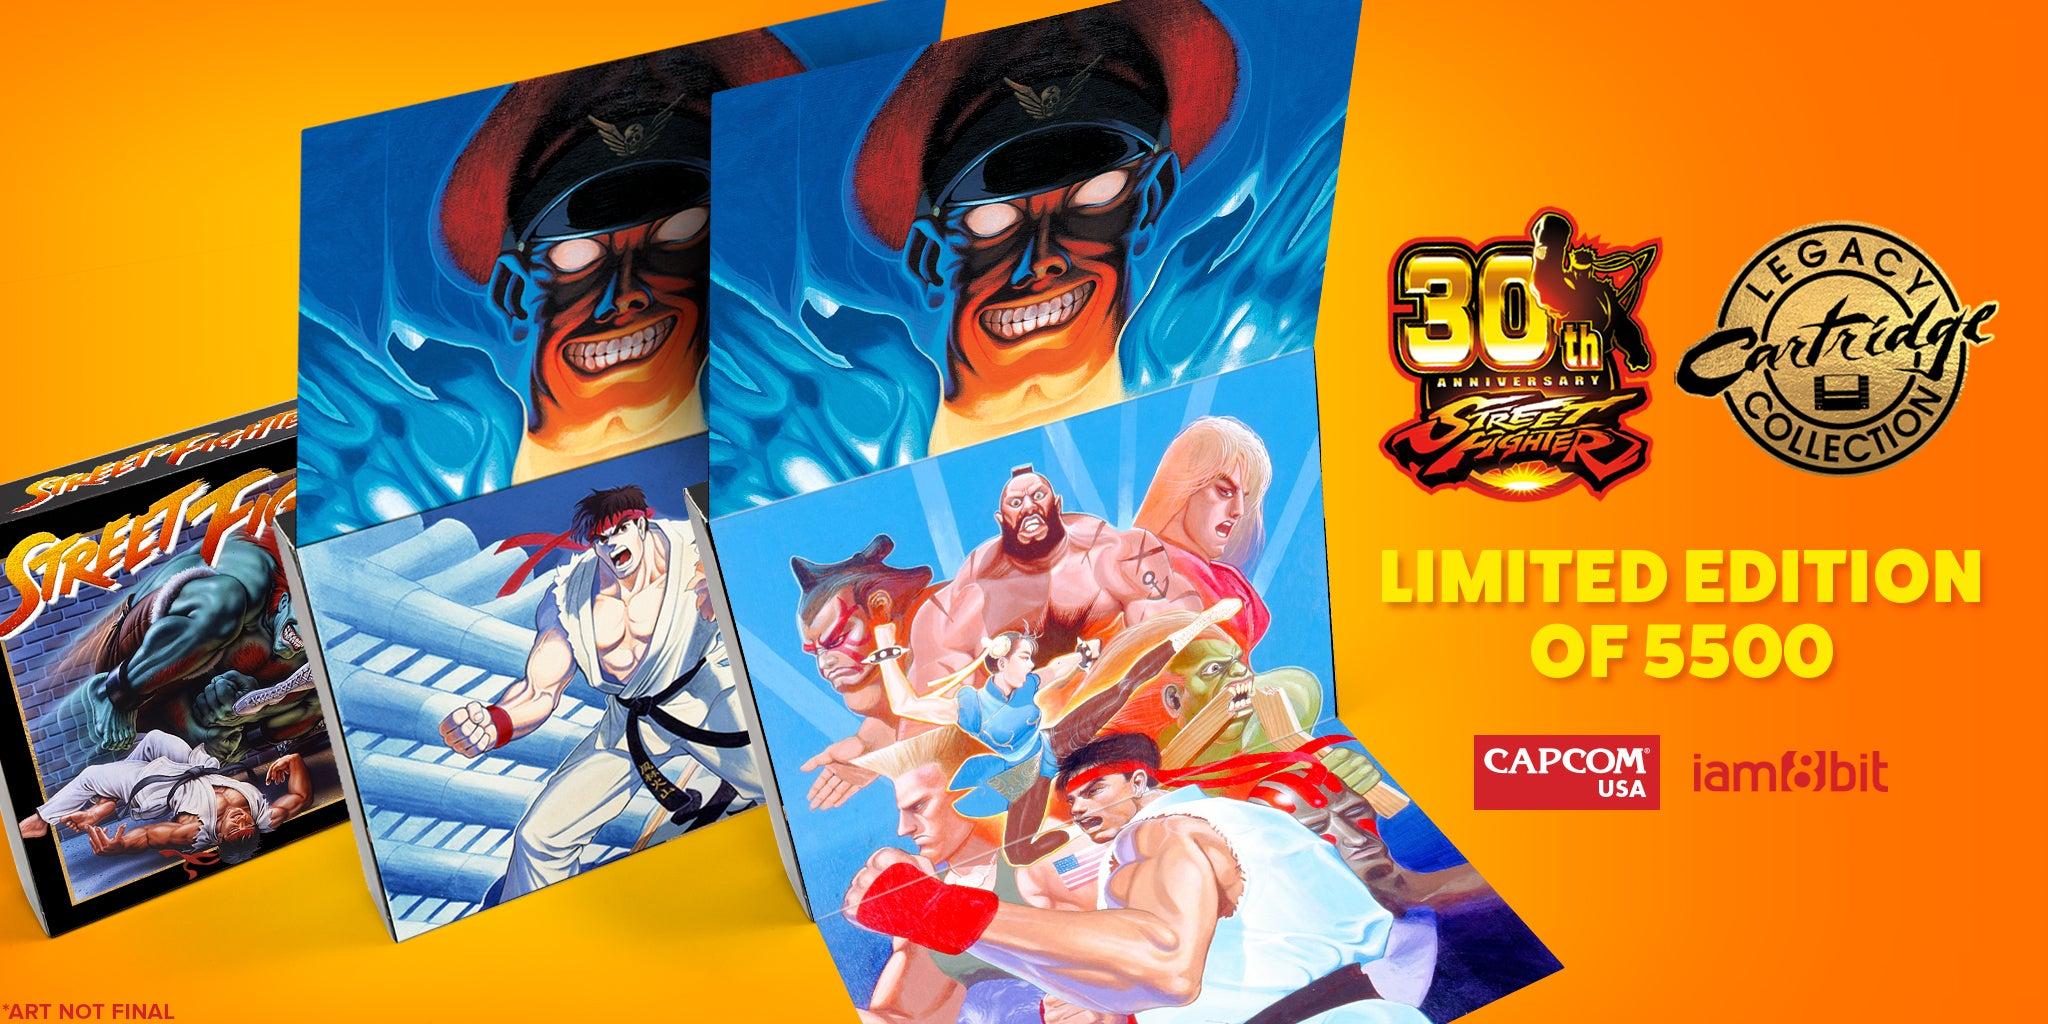 SNES Super Street Fighter 2